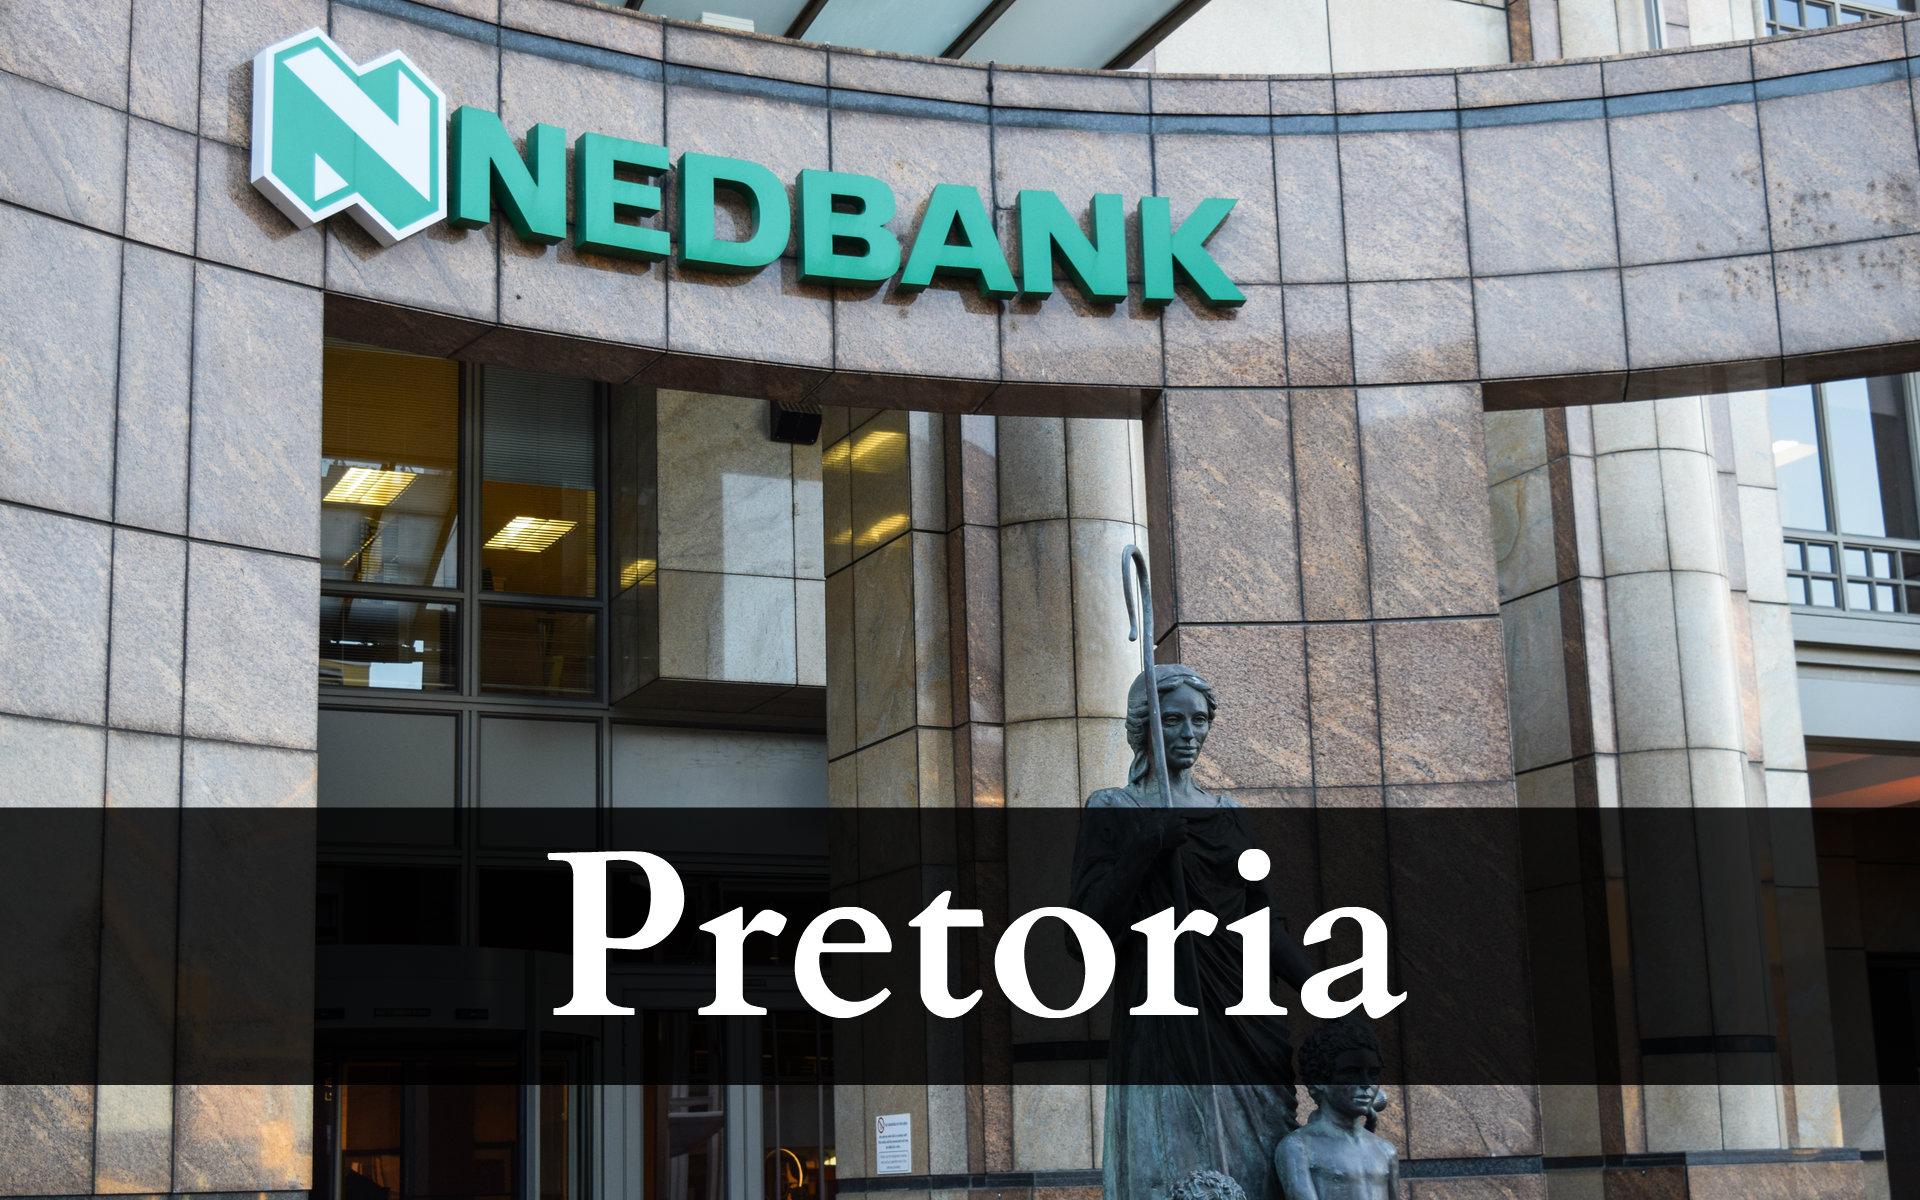 Nedbank Pretoria